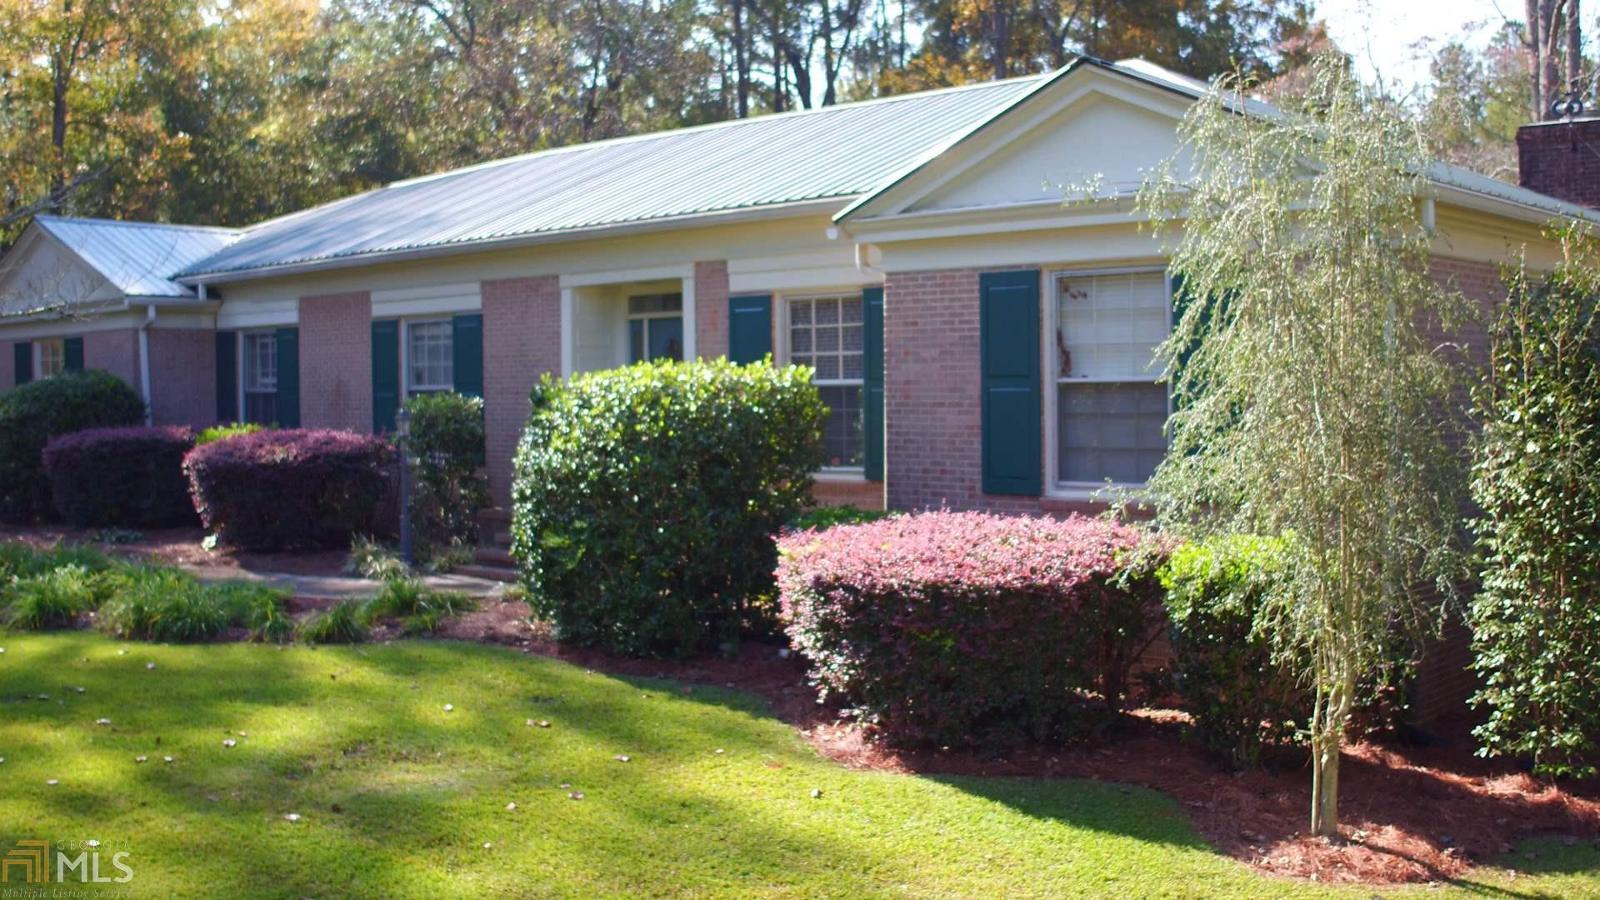 737 Monticello Hwy Gray Ga Mls 8286492 Better Homes